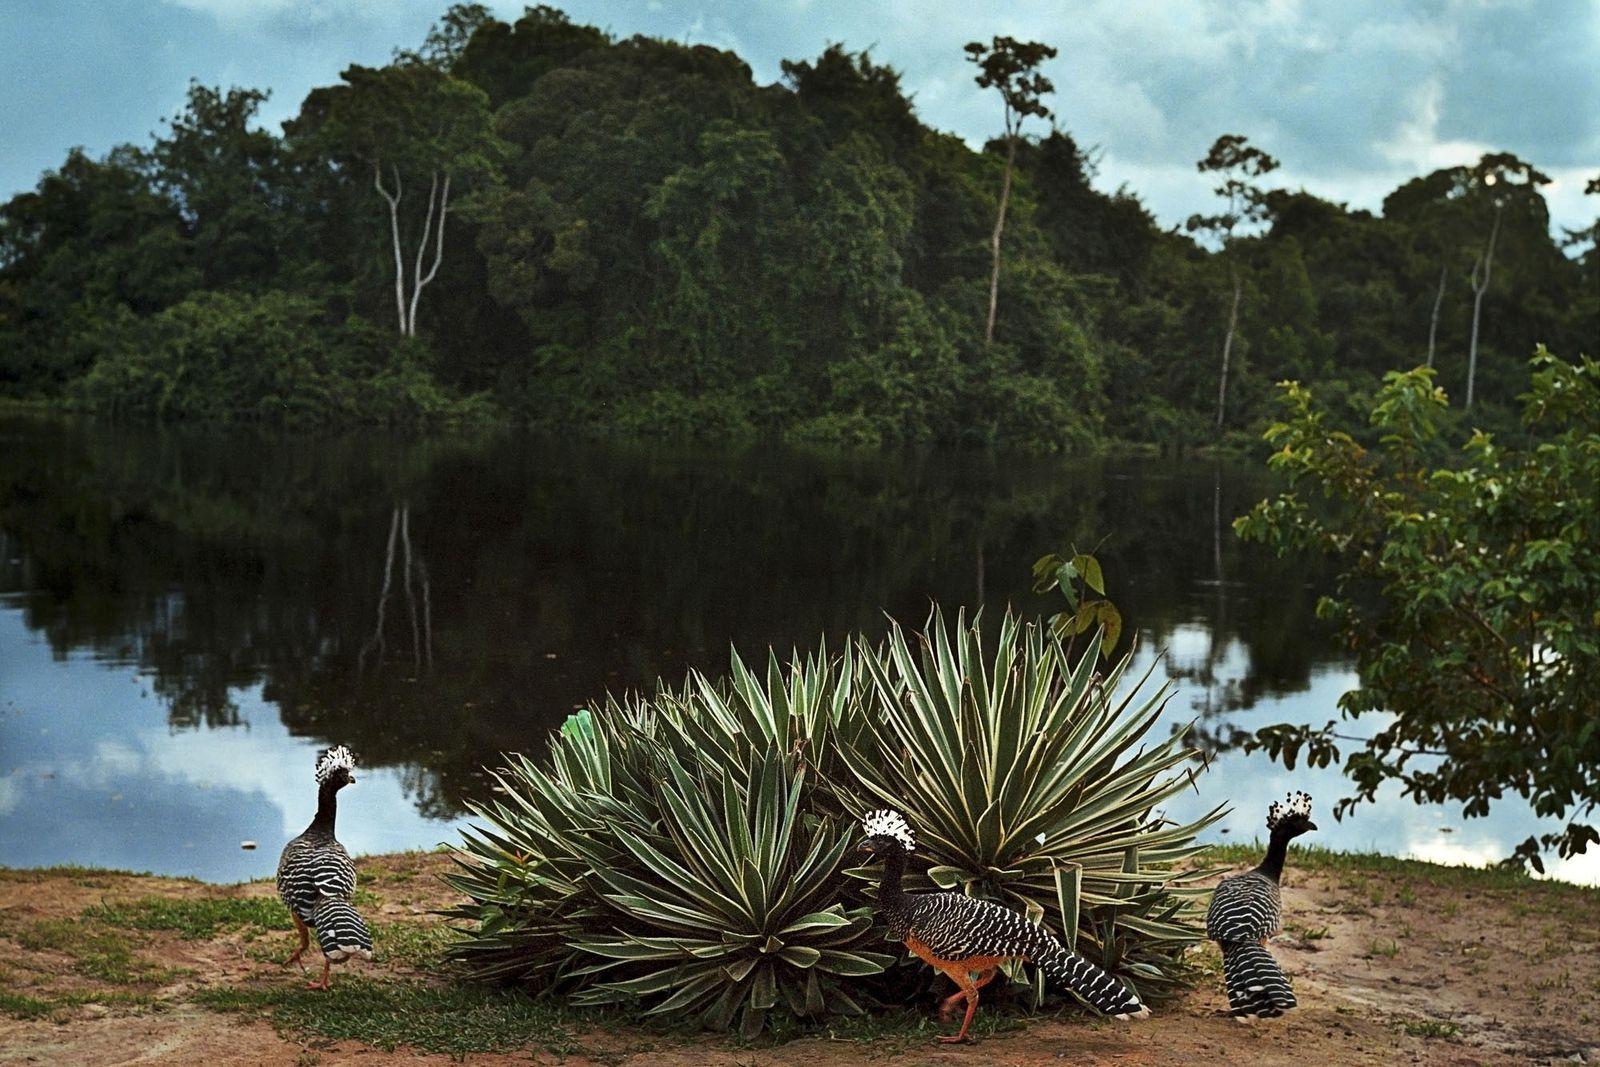 Vögel am Ufer des Rio Novo